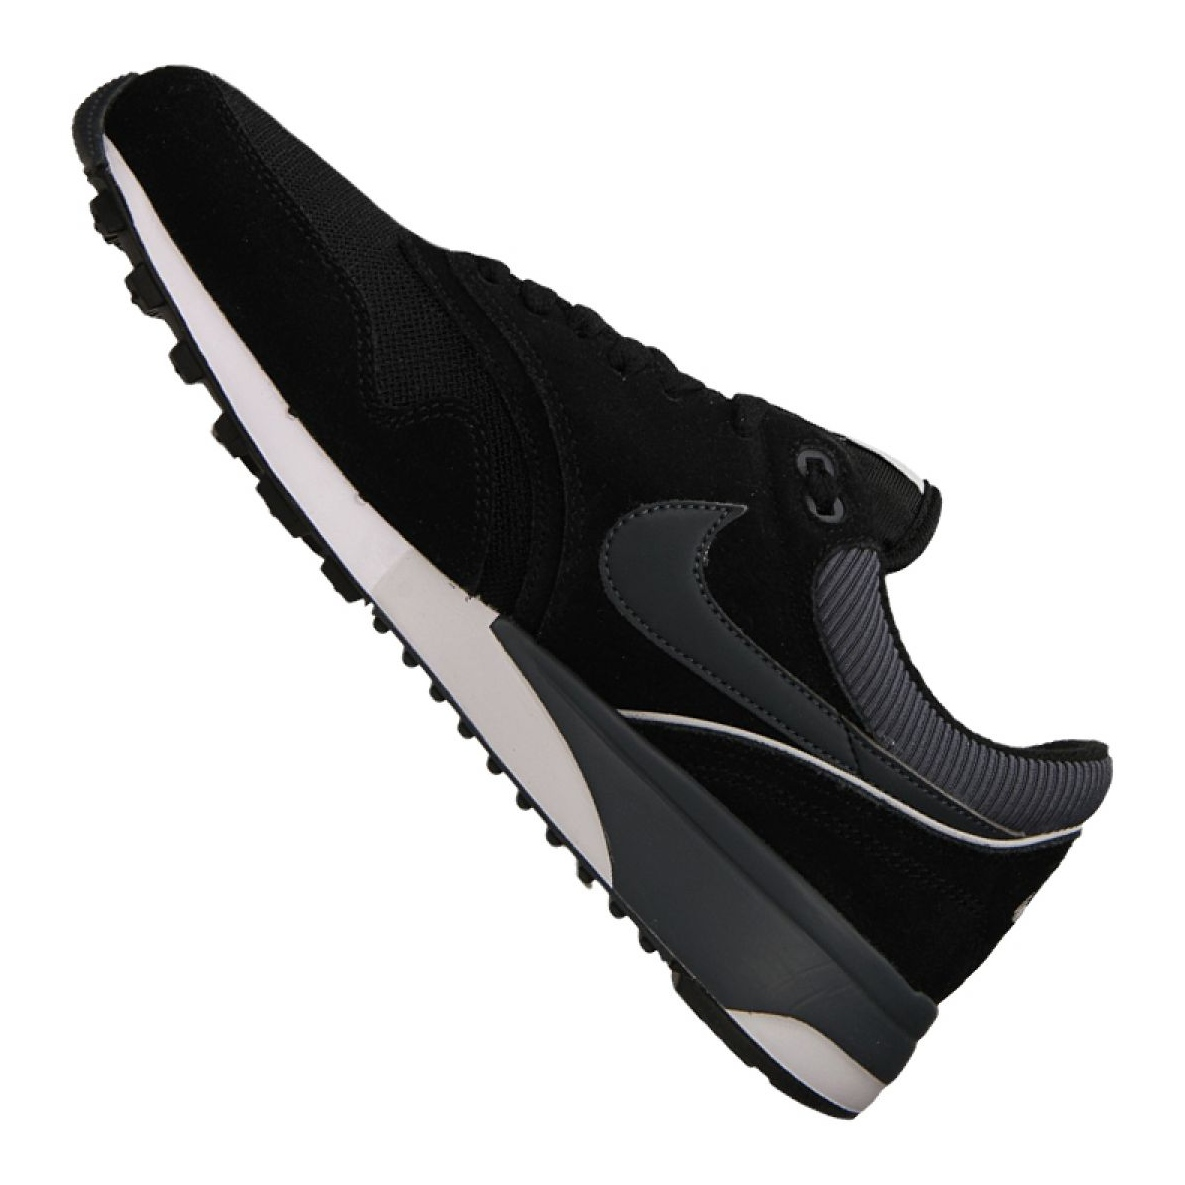 Nike Air Max Odyssey M 652989 001 skor svart